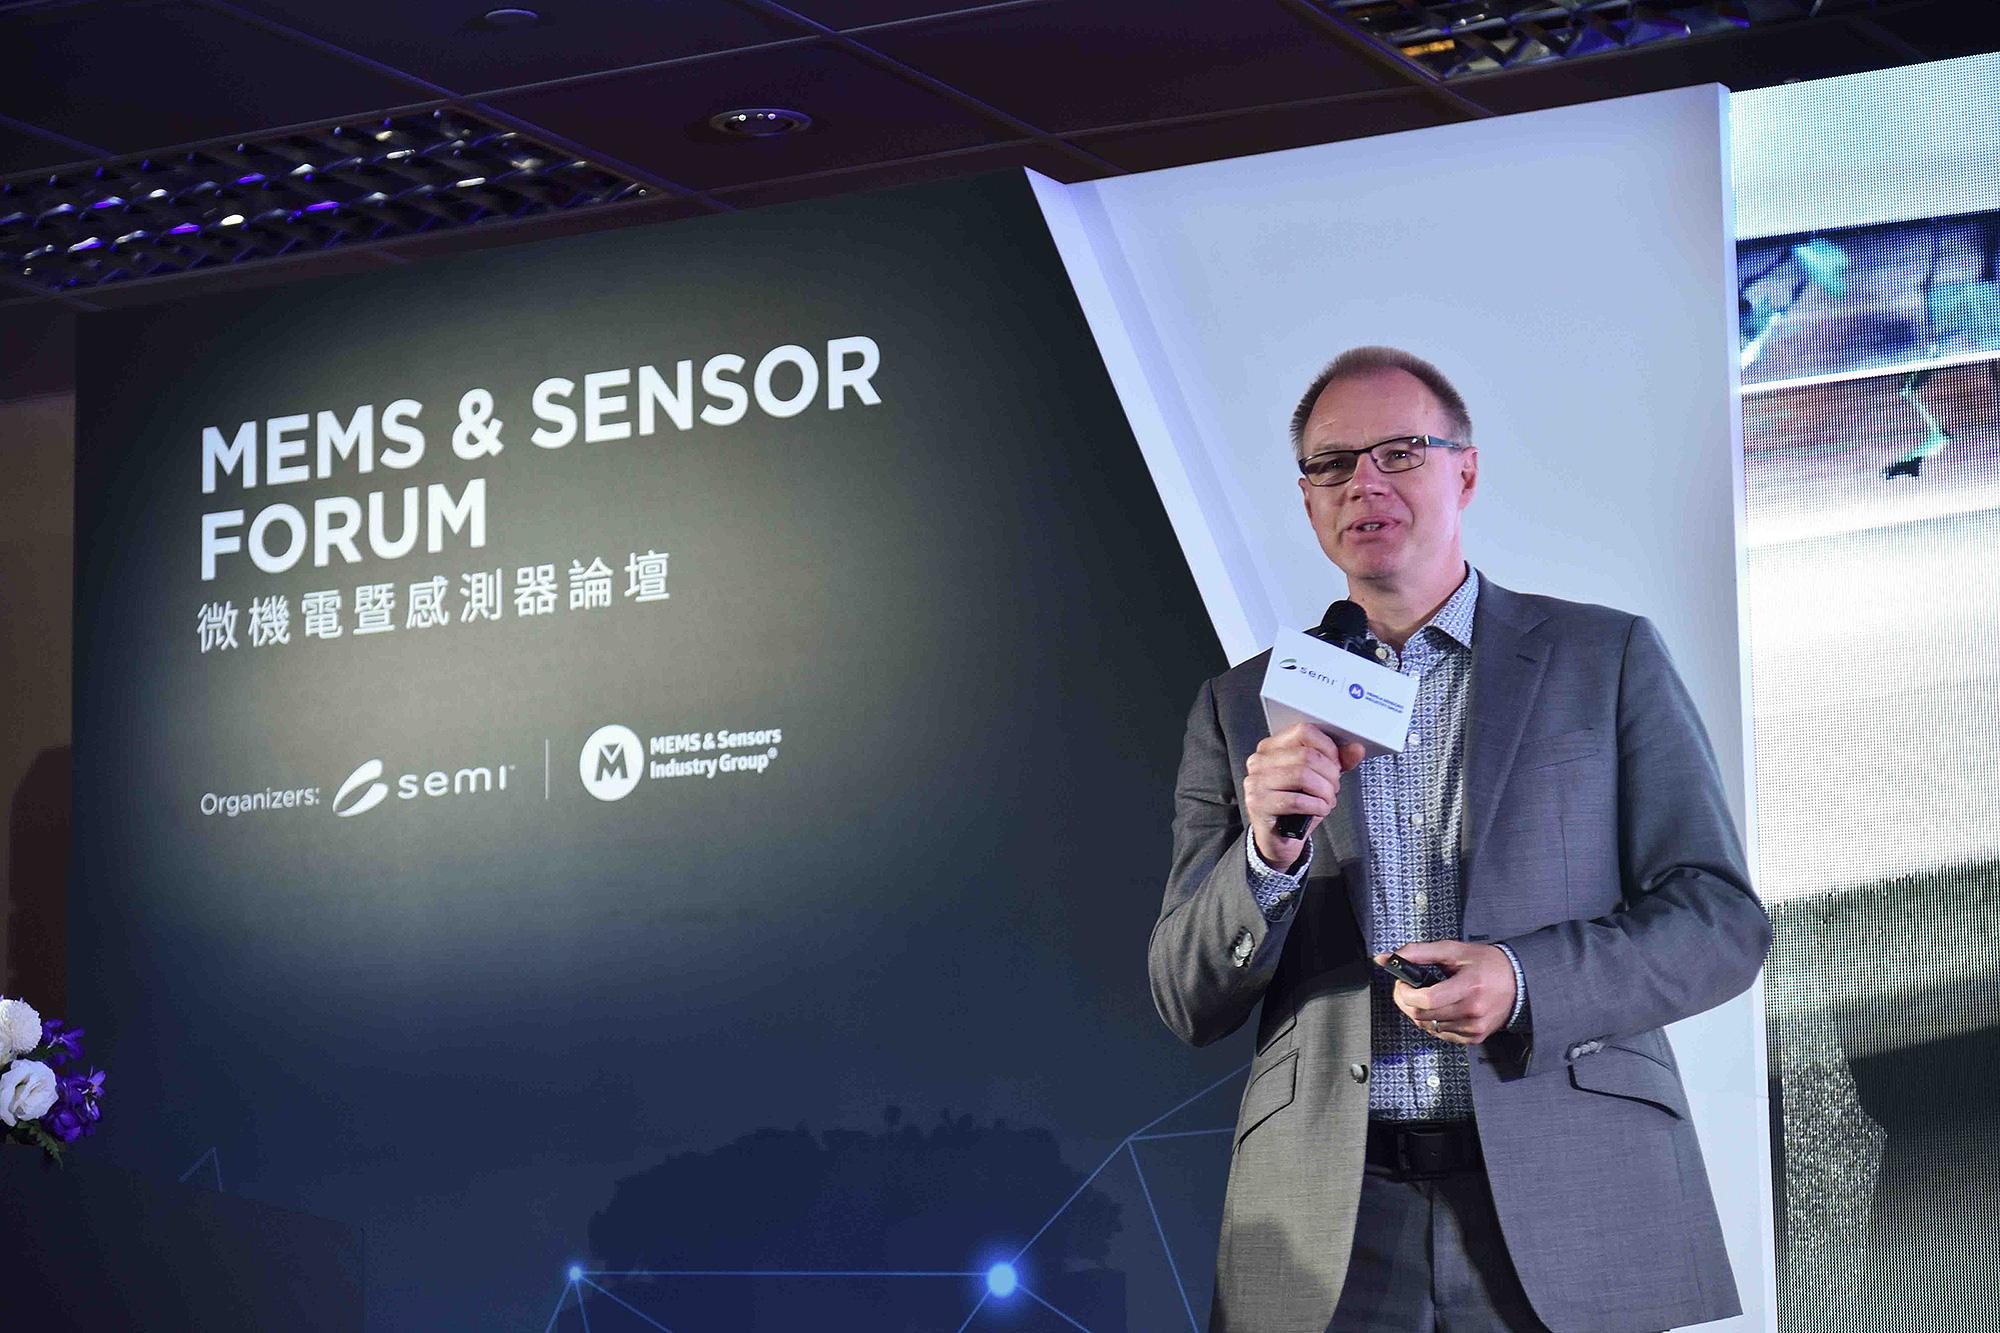 Audi 德國總部電子與半導體技術中心負責人 Berthold Hellenthal 受邀來台參與 2019 SEMICON Taiwan 微機電暨感測器論壇